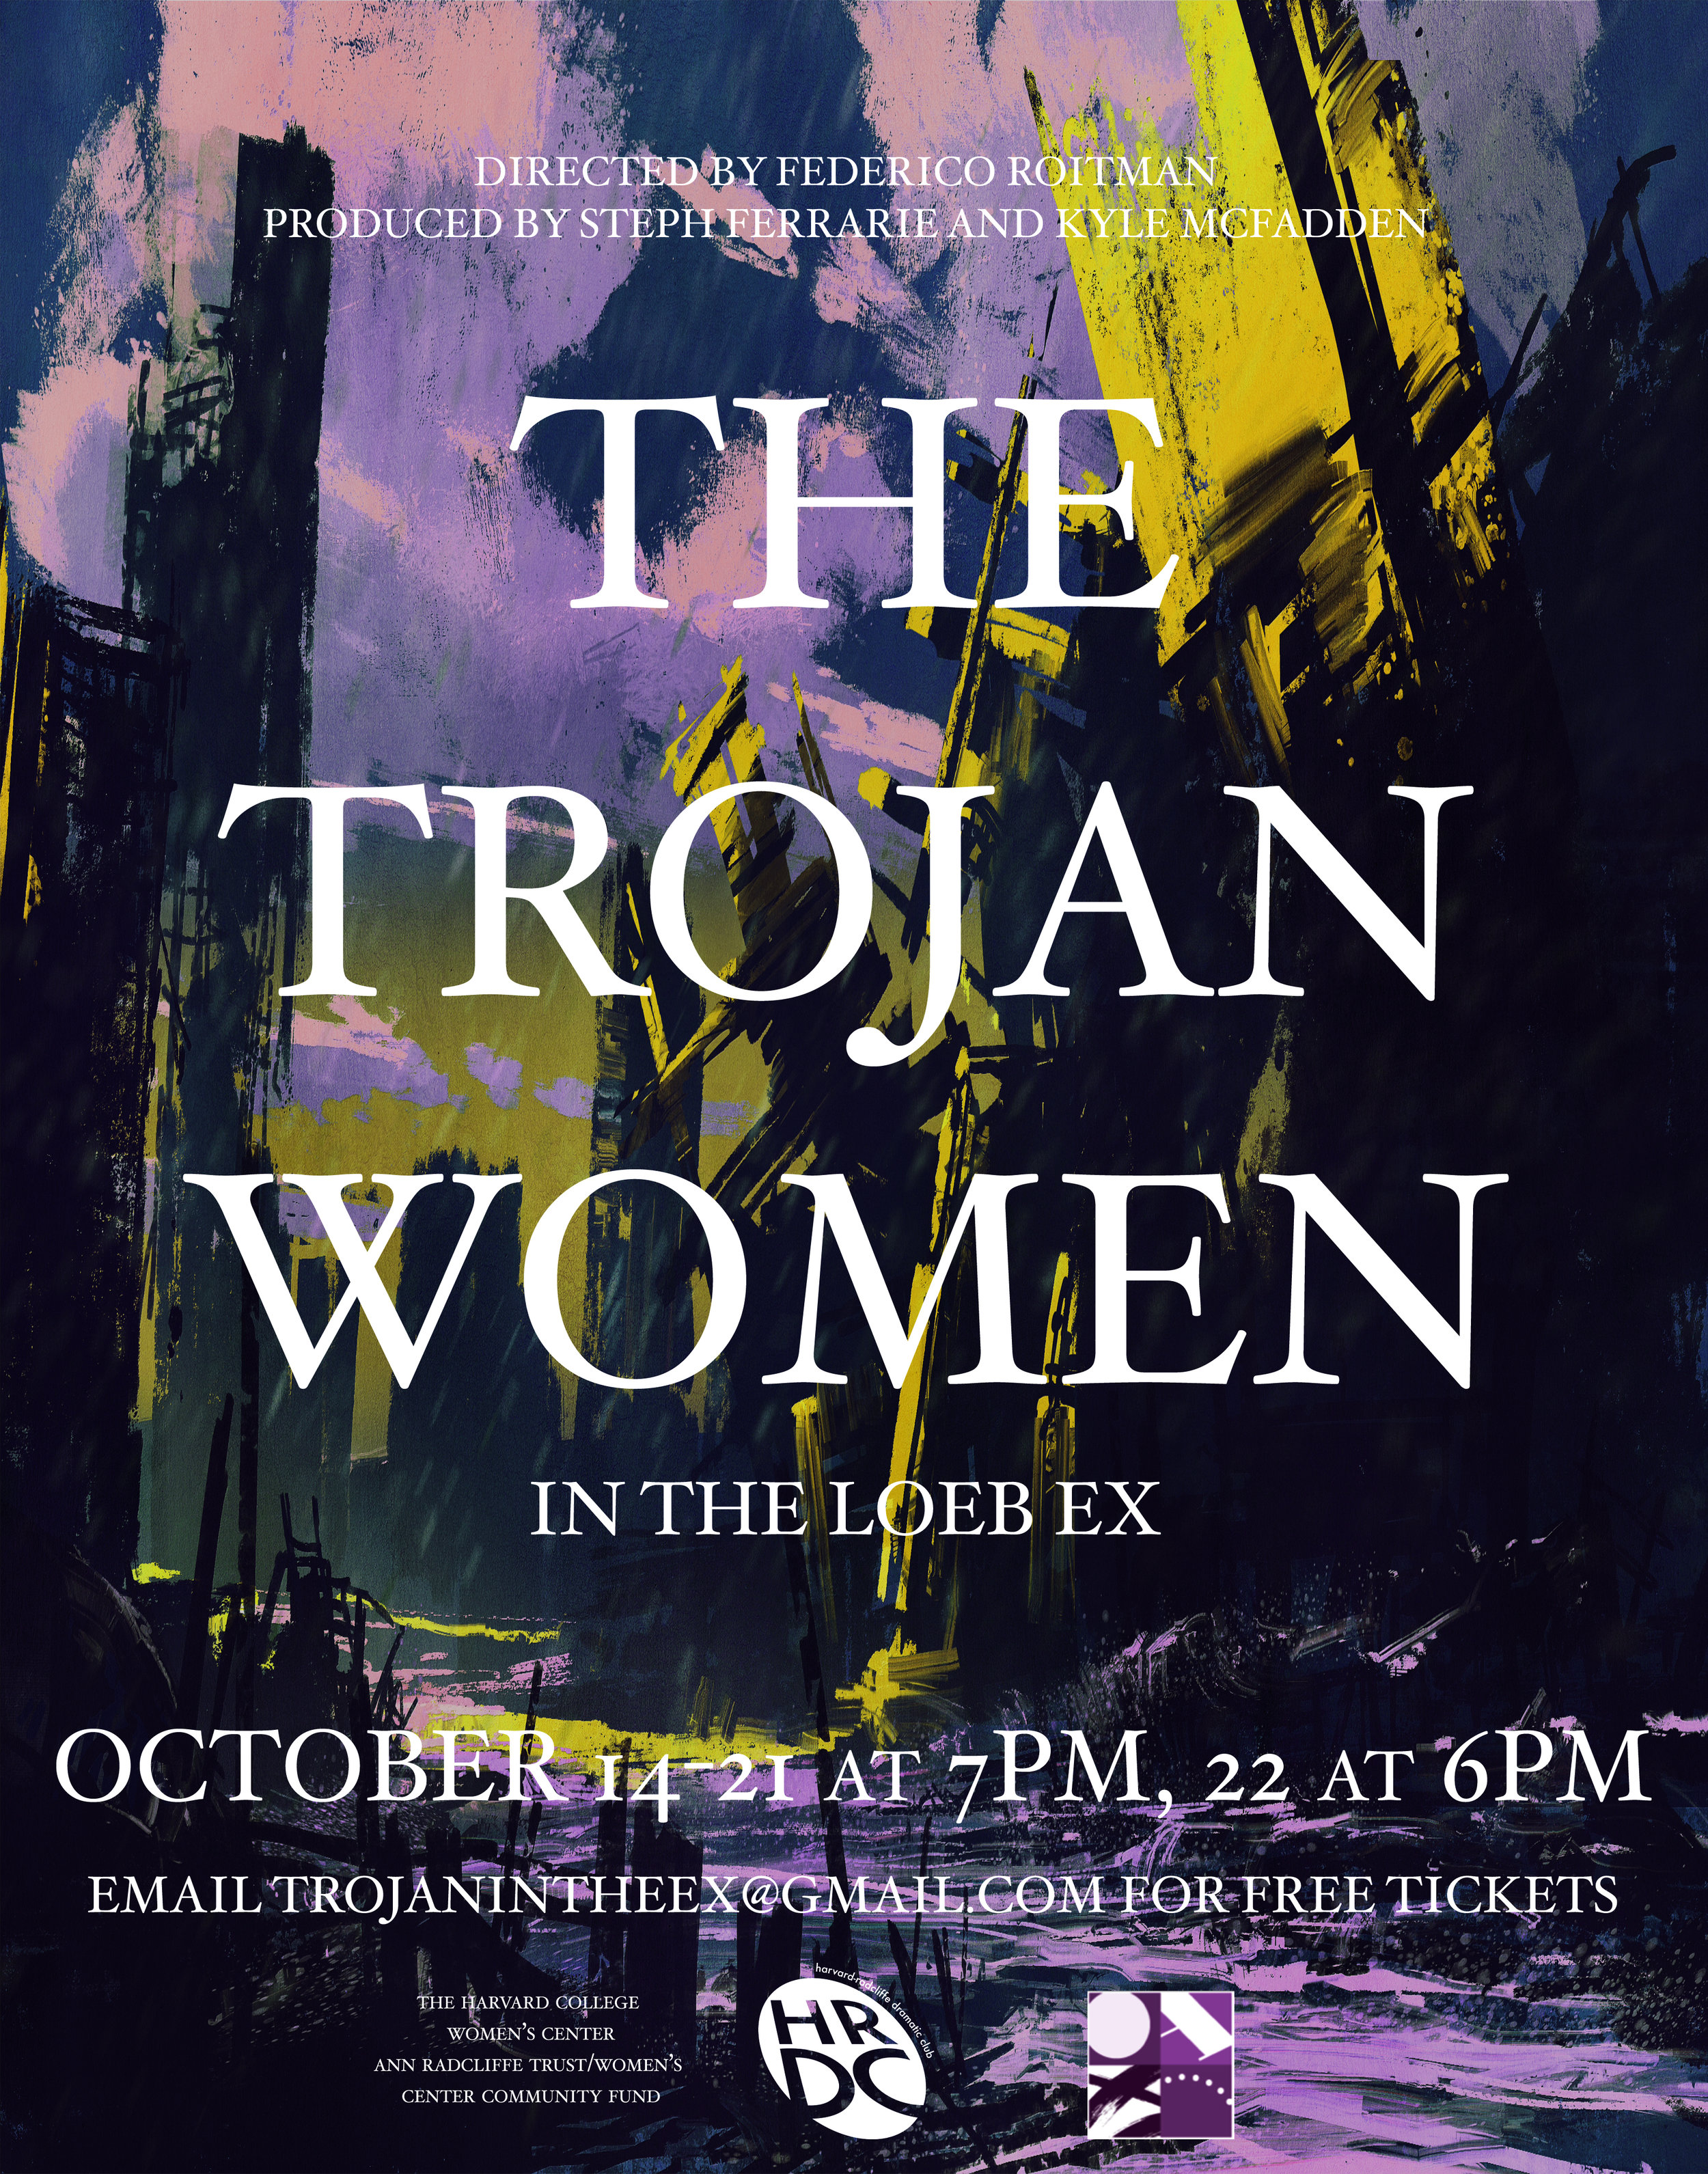 Trojan Women Poster copy.jpg